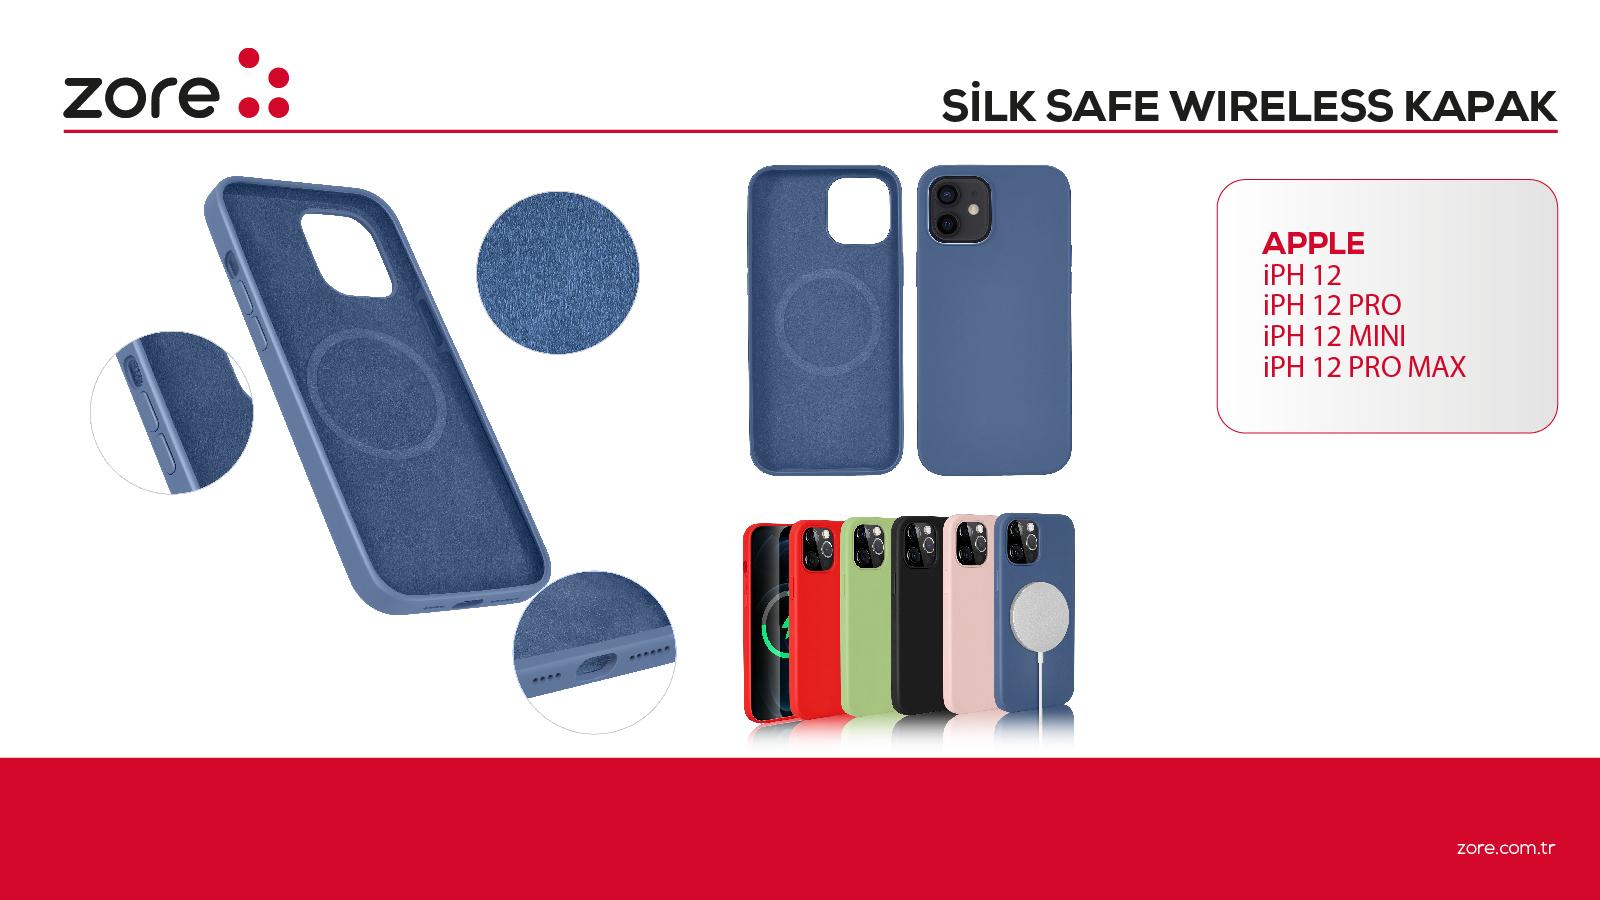 Silk safe-01.jpg (403 KB)